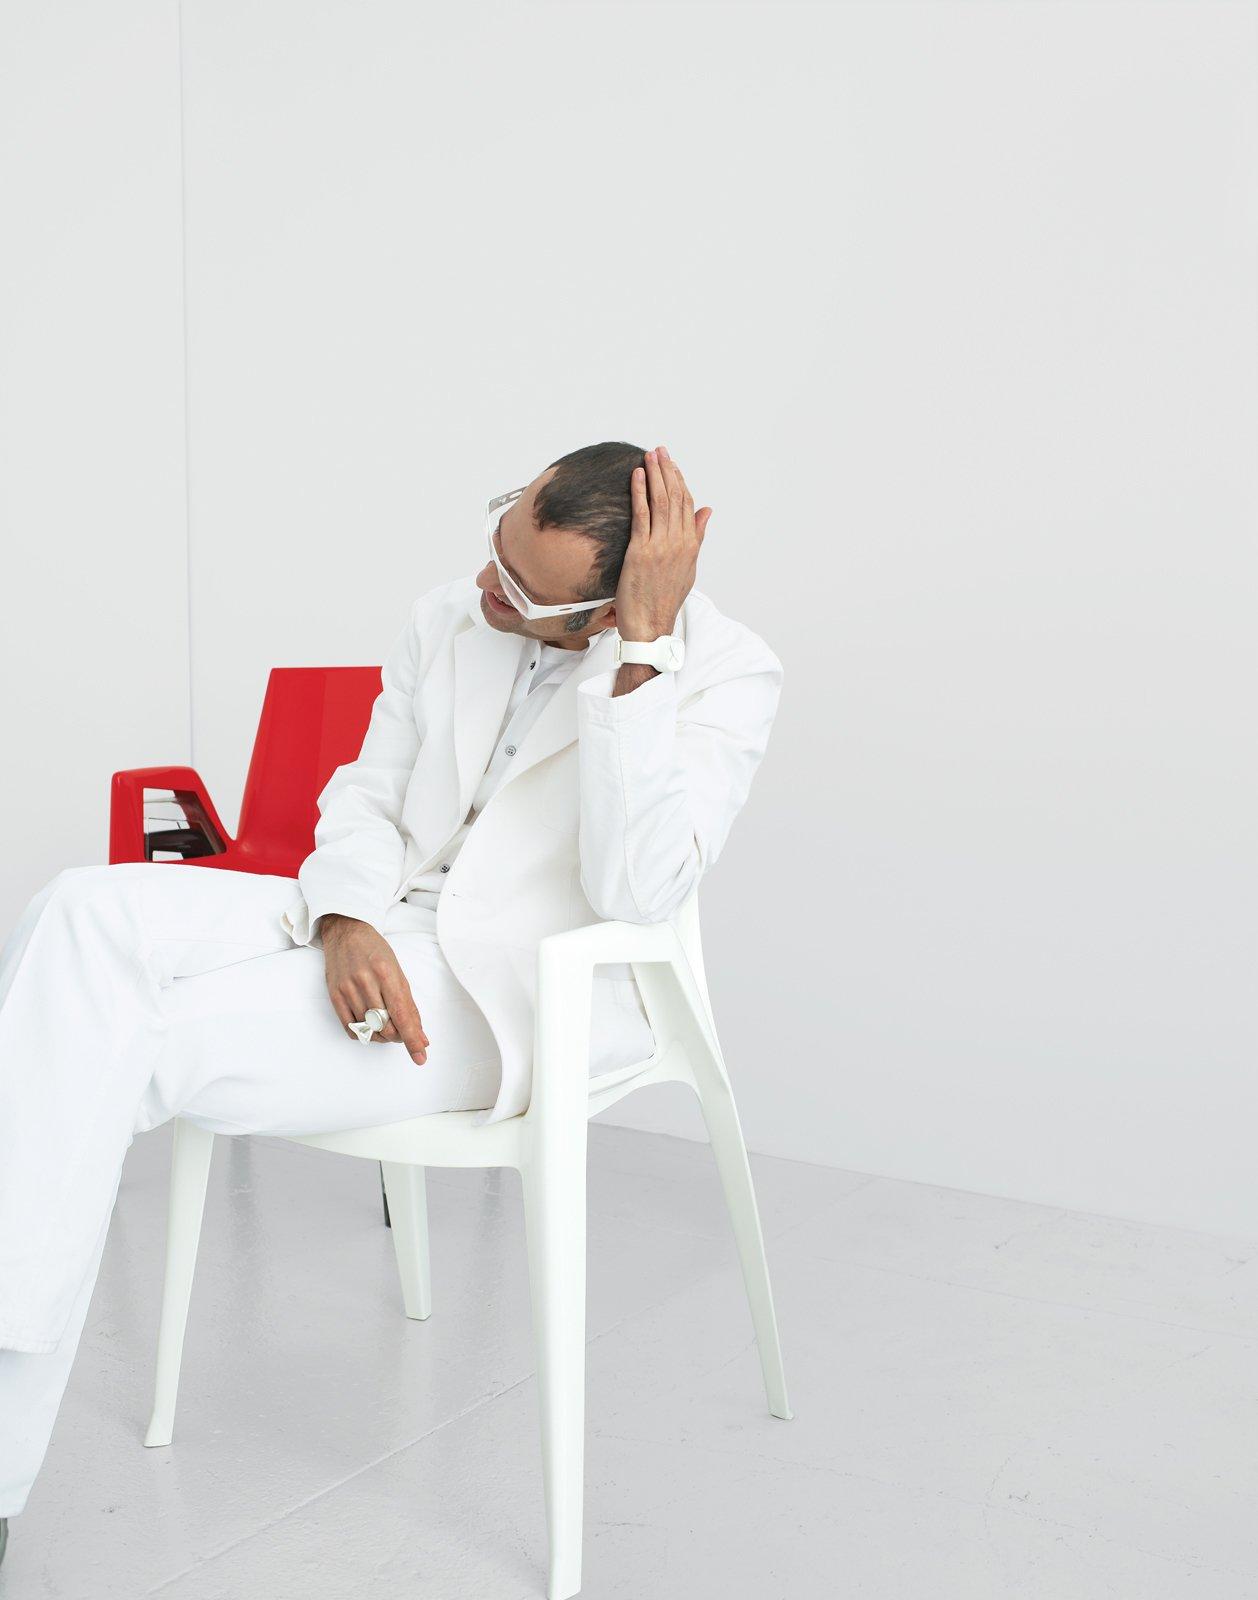 Karim Rashid  Photo 2 of 4 in Karim Rashid Picks the Top 4 Luxury Plastic Chairs